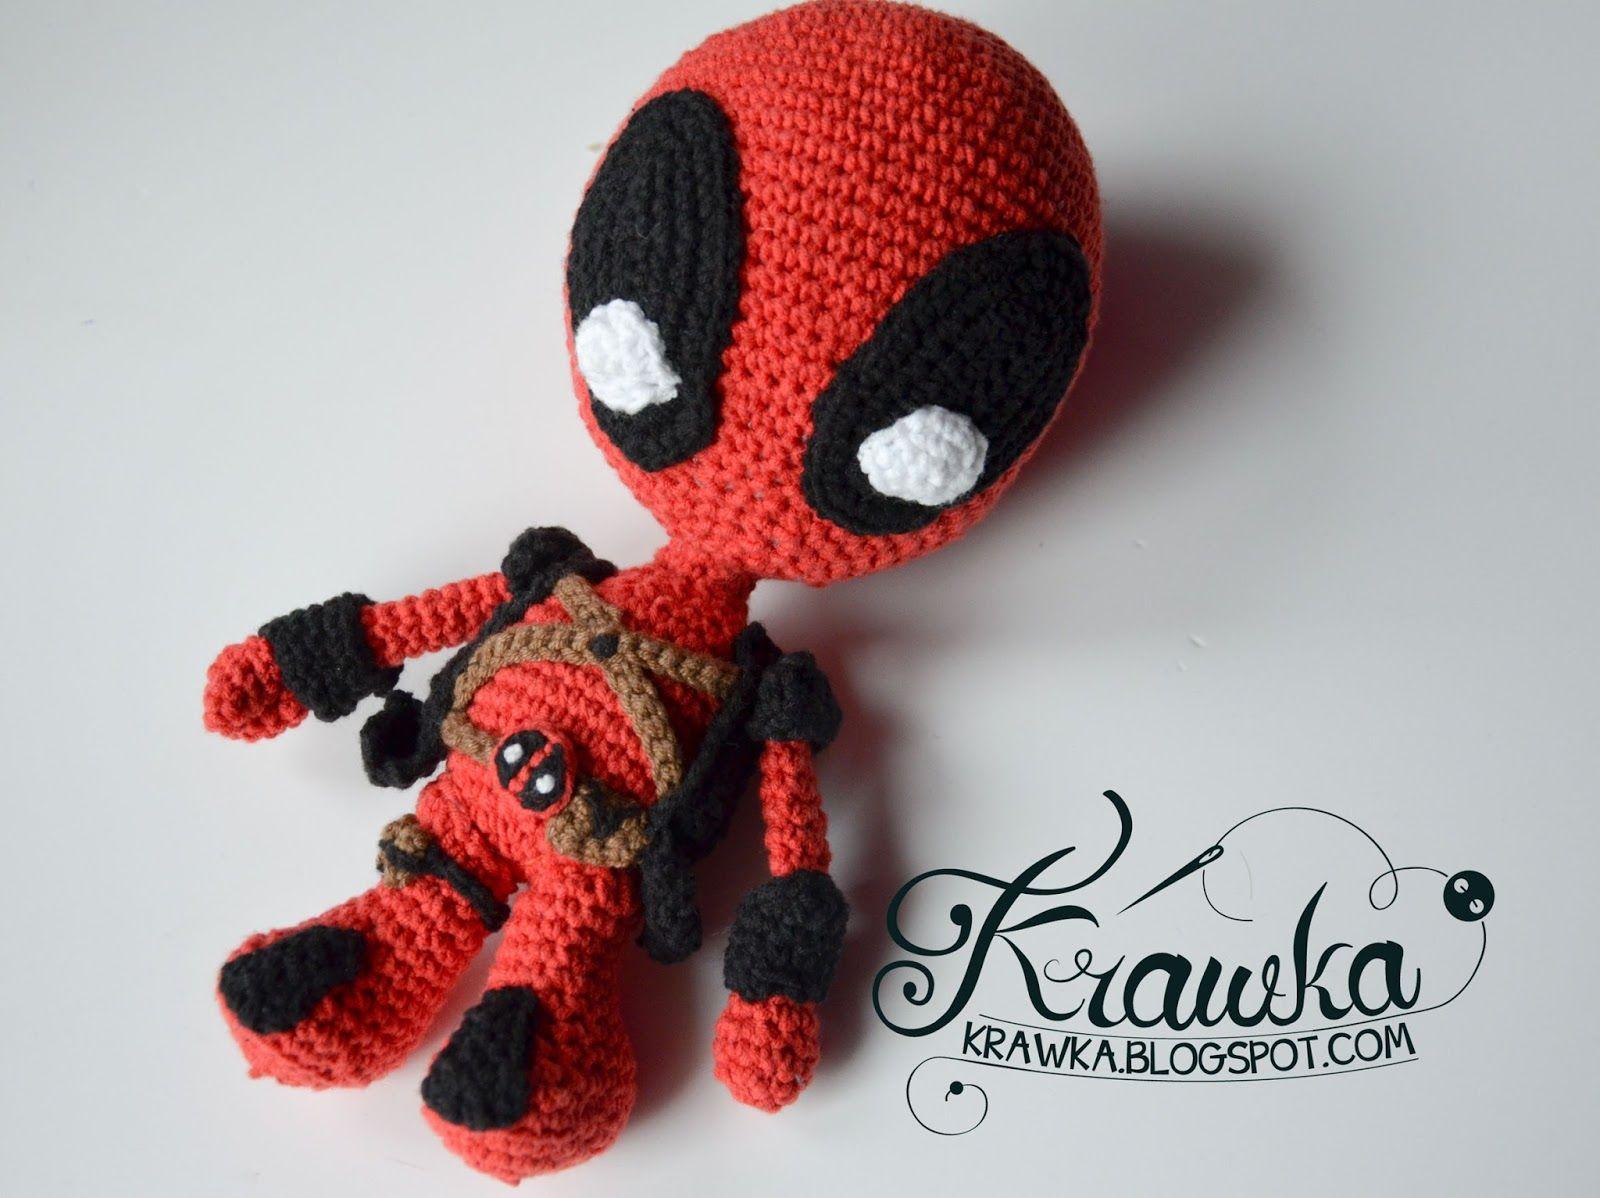 Krawka: Deadpool superhero / villain Marvel comic / movie crochet ...